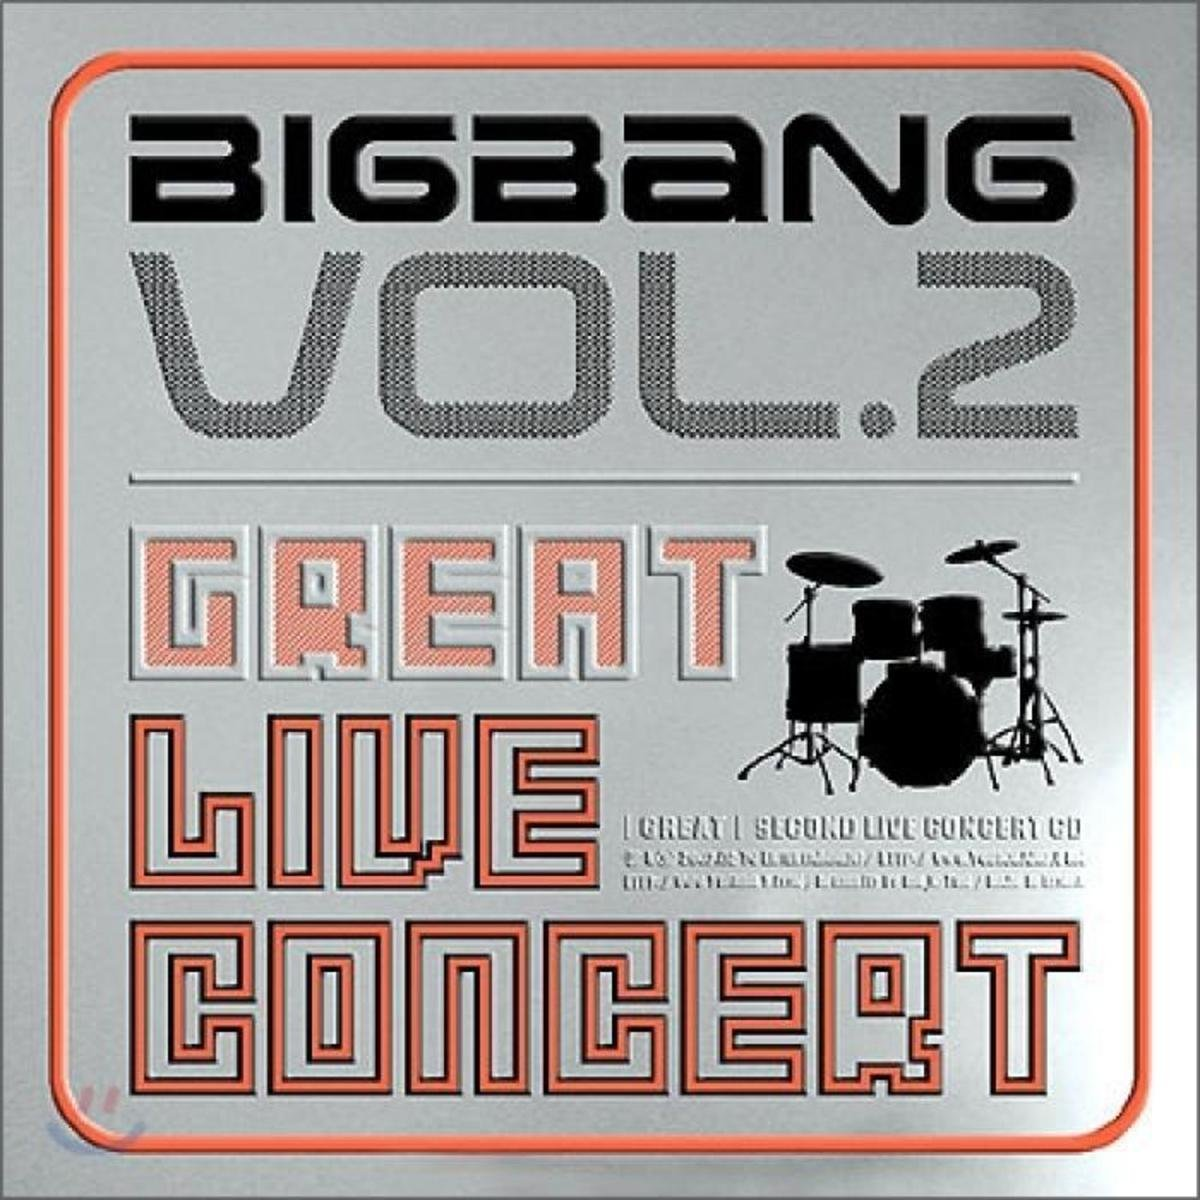 BIGBANG -  2008 2nd Live Album [The Great]_8809314510173